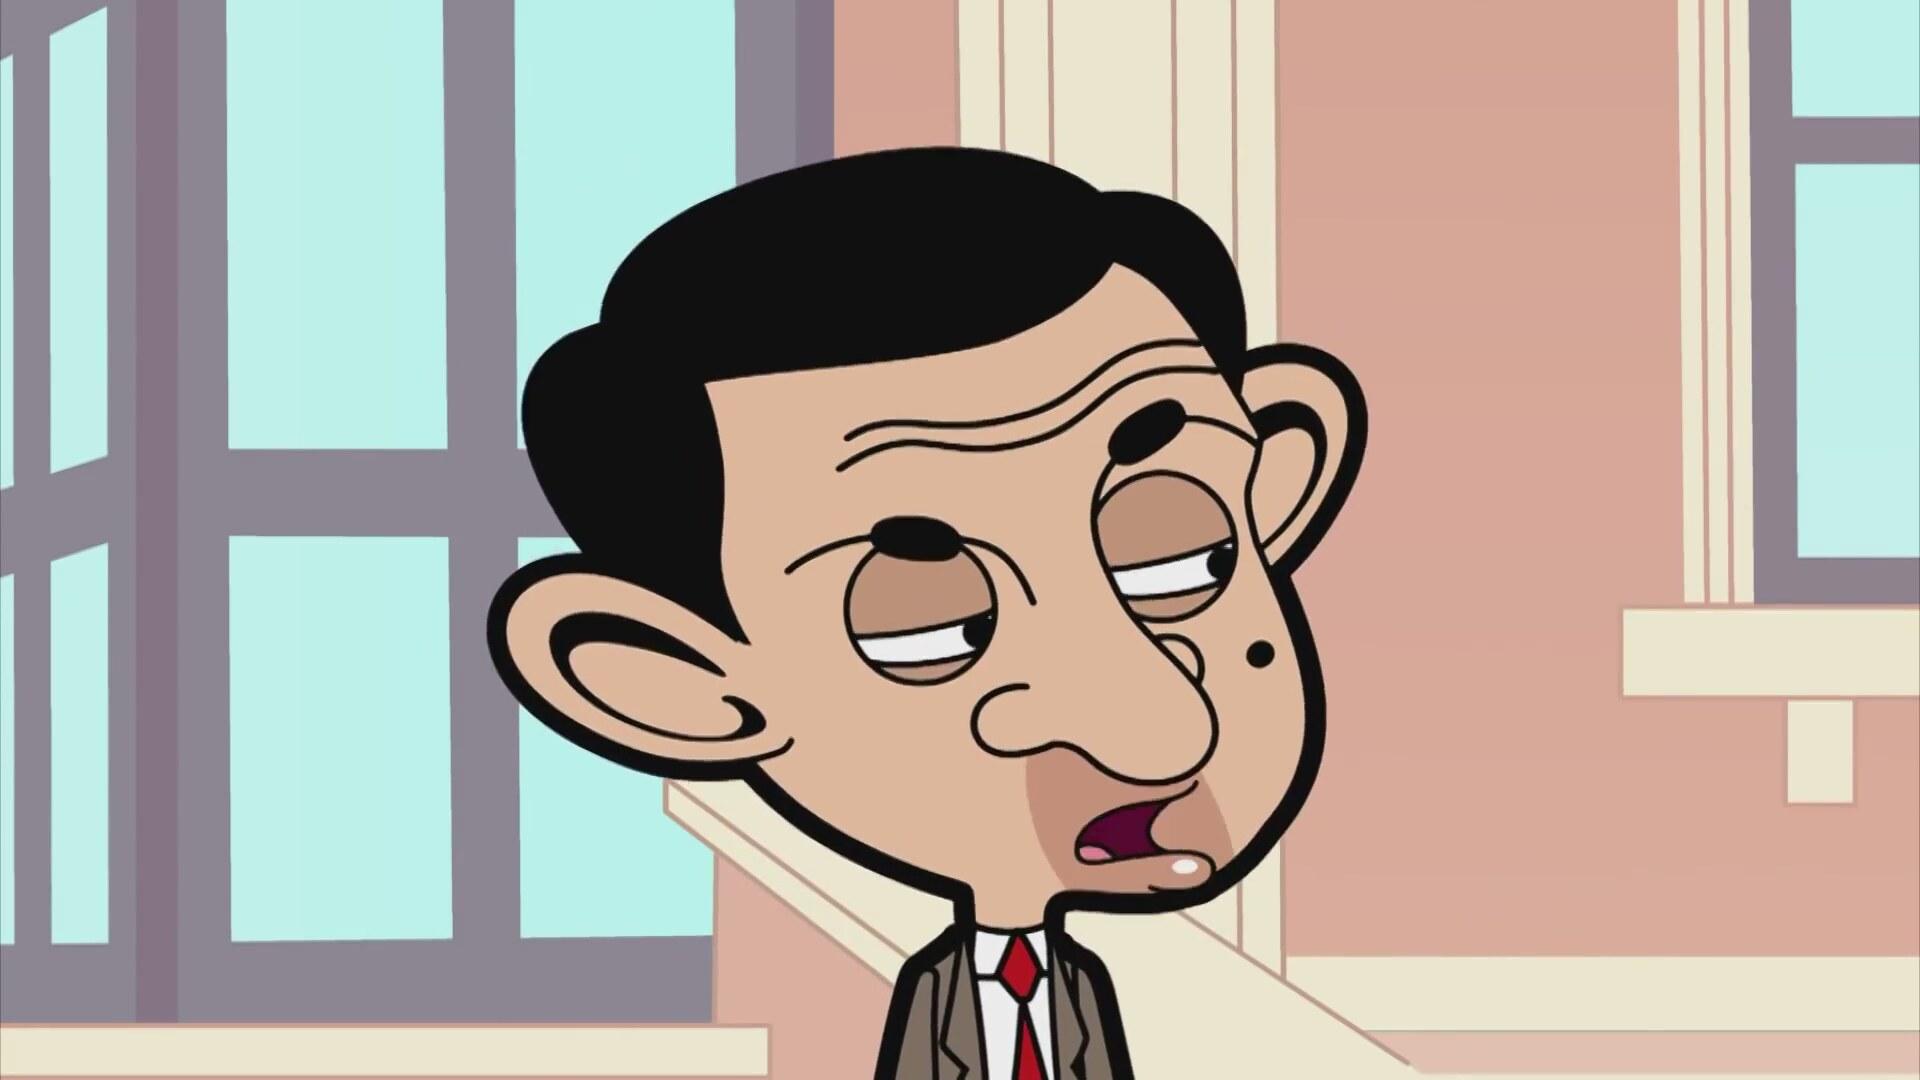 cartoon full episodes cartoon - HD1920×1080